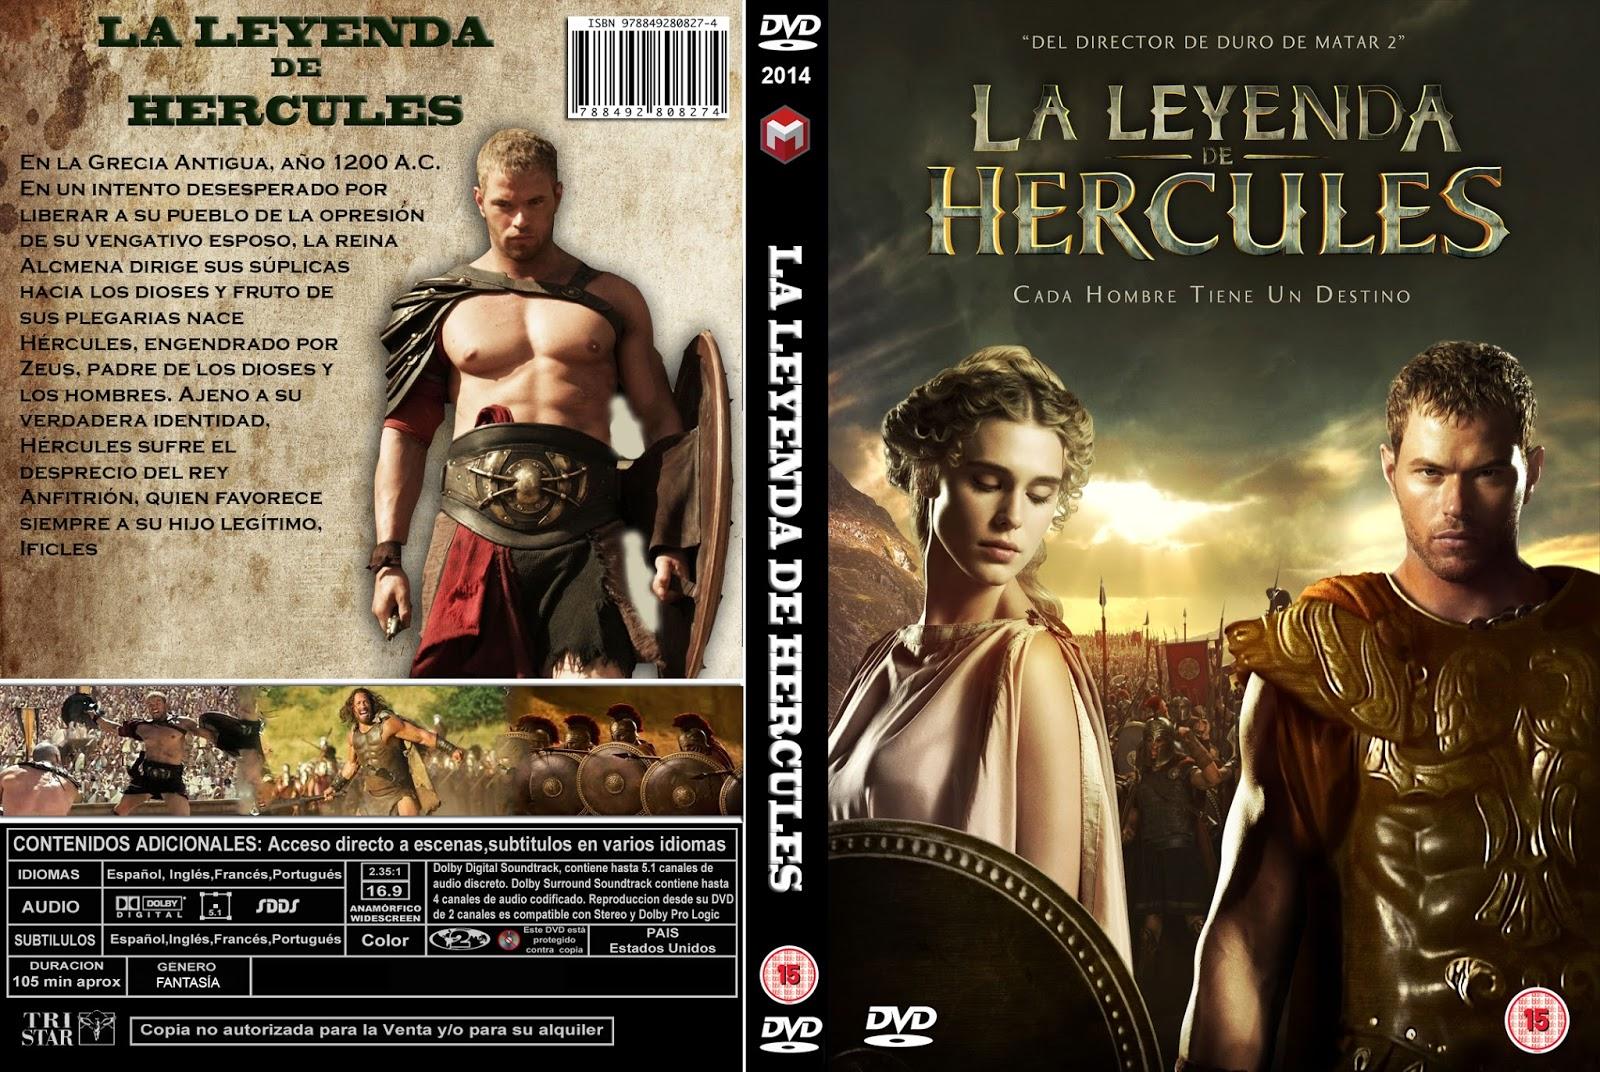 Hercules 2014 film  Wikipedia